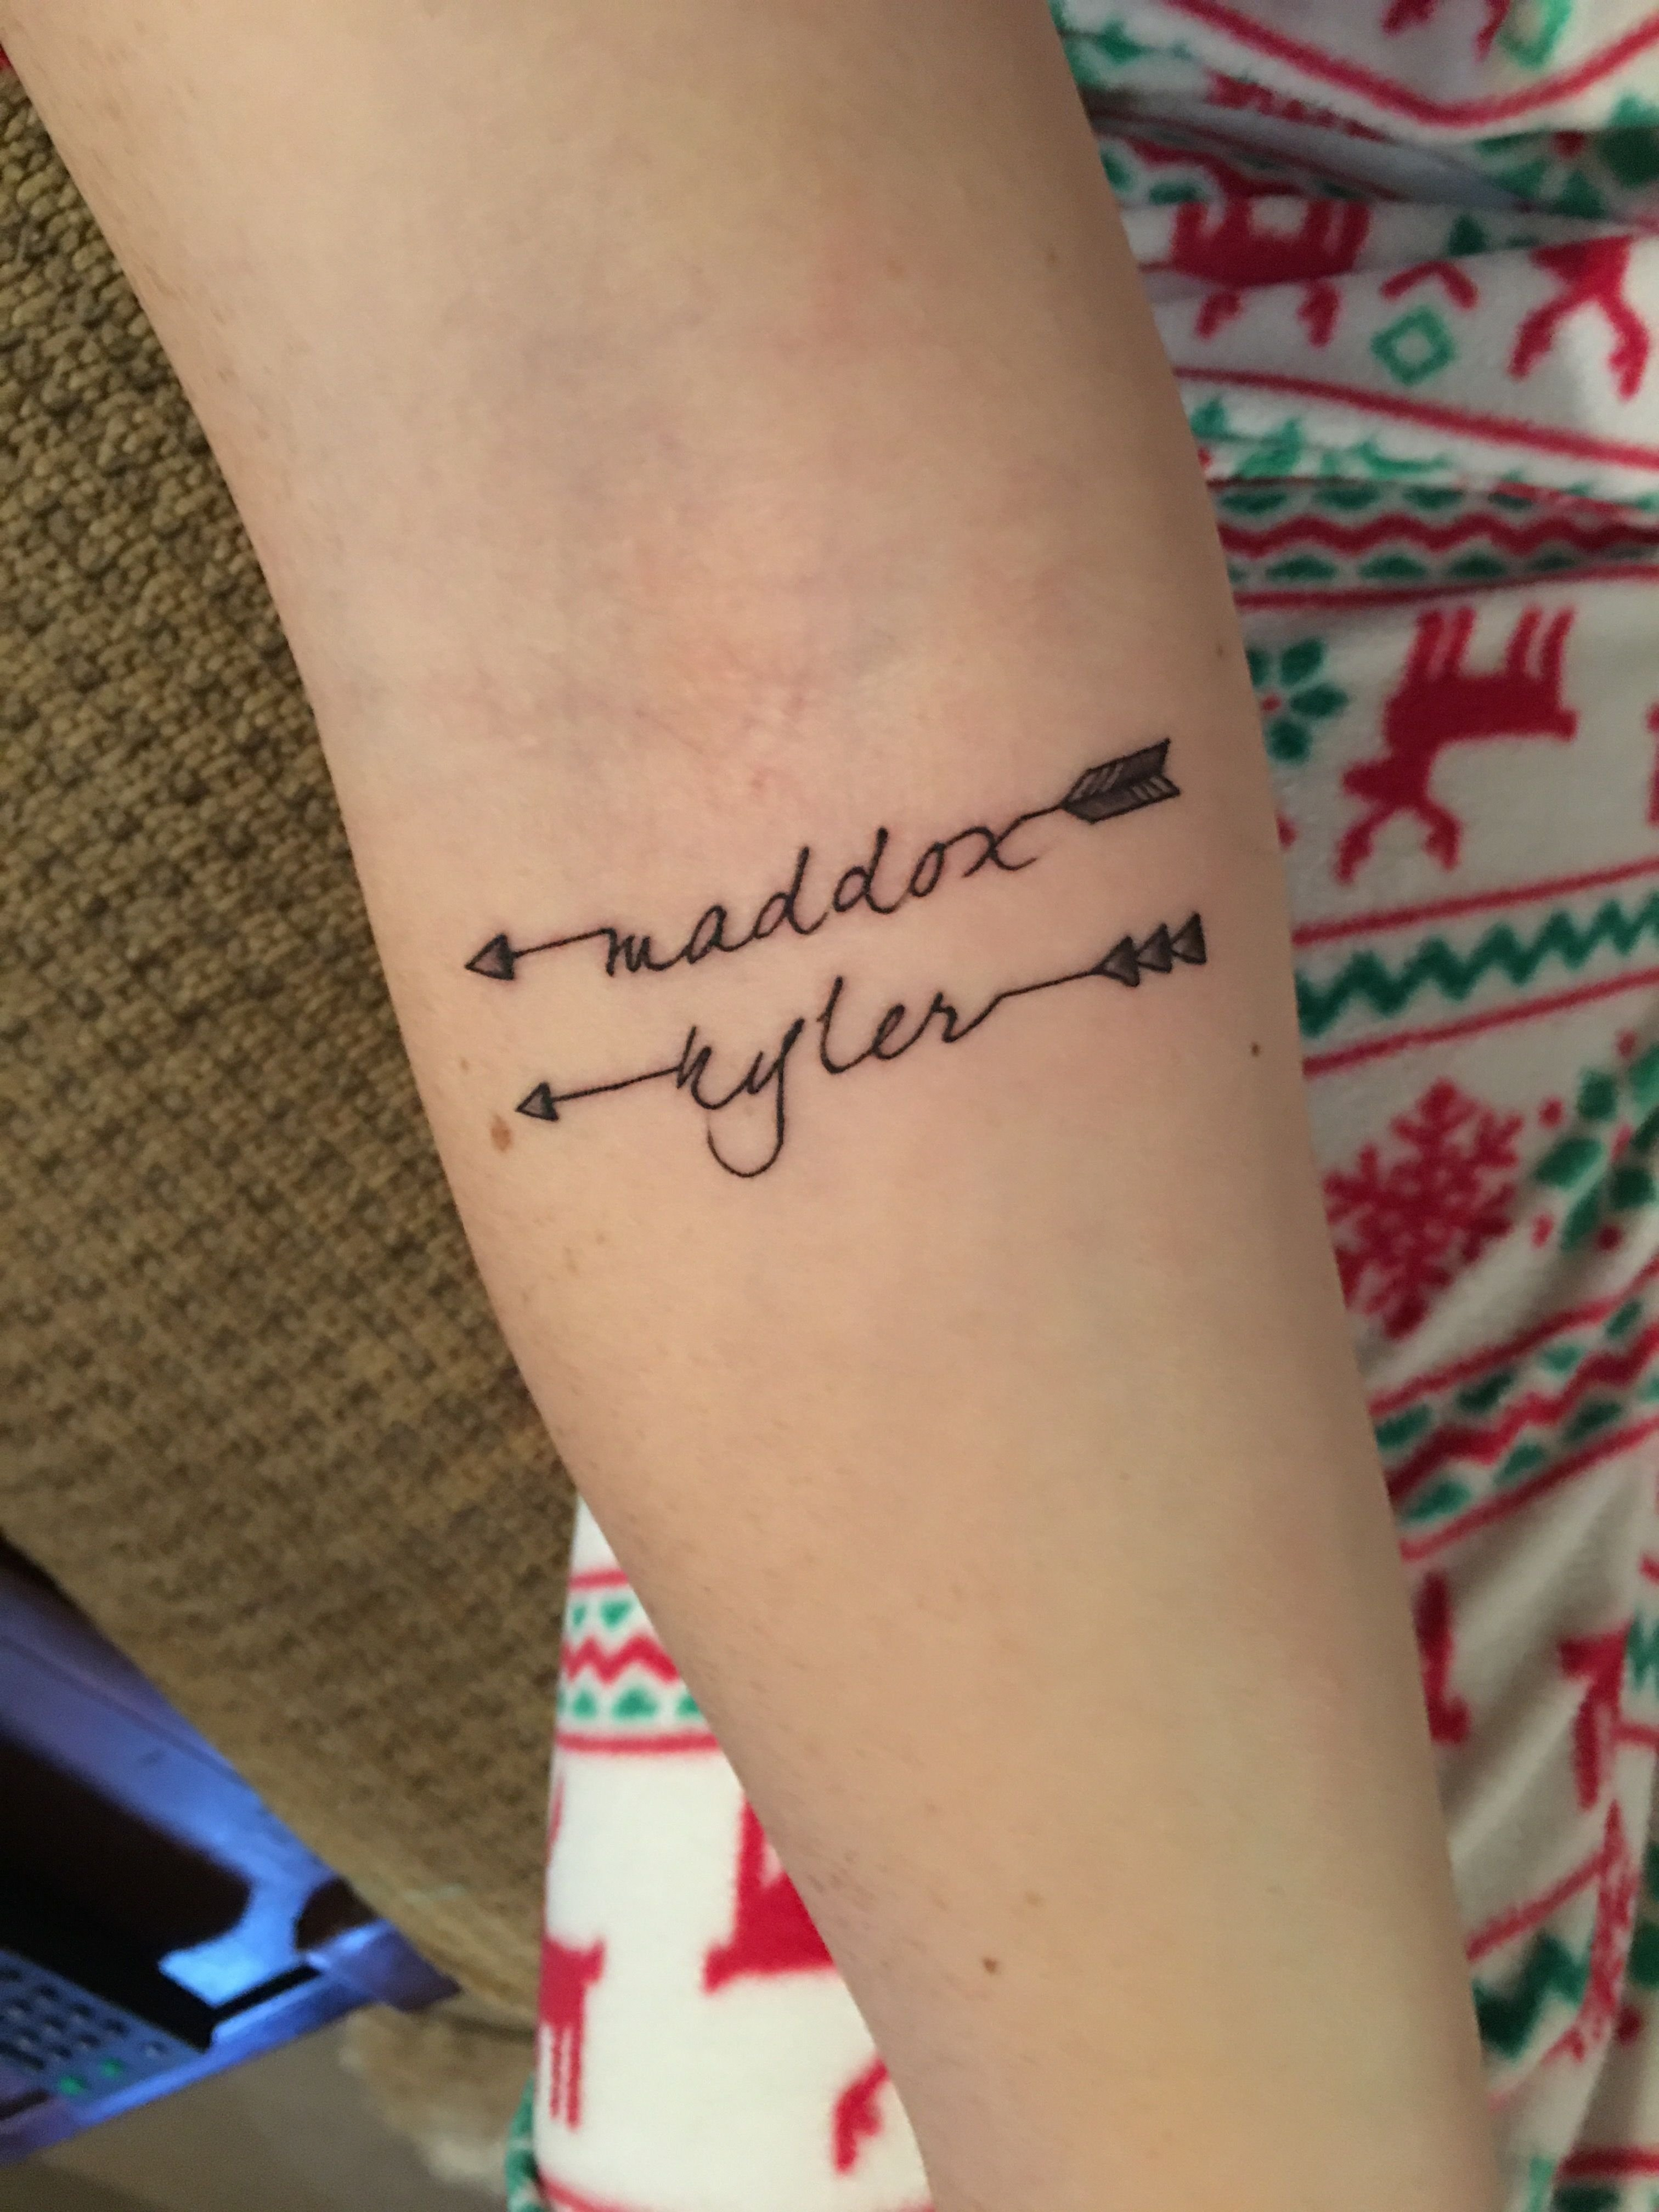 10 Fashionable Tattoo Ideas For Baby Names tattoo namen namendesigns und ideen tattoos arrow tattoo and 1